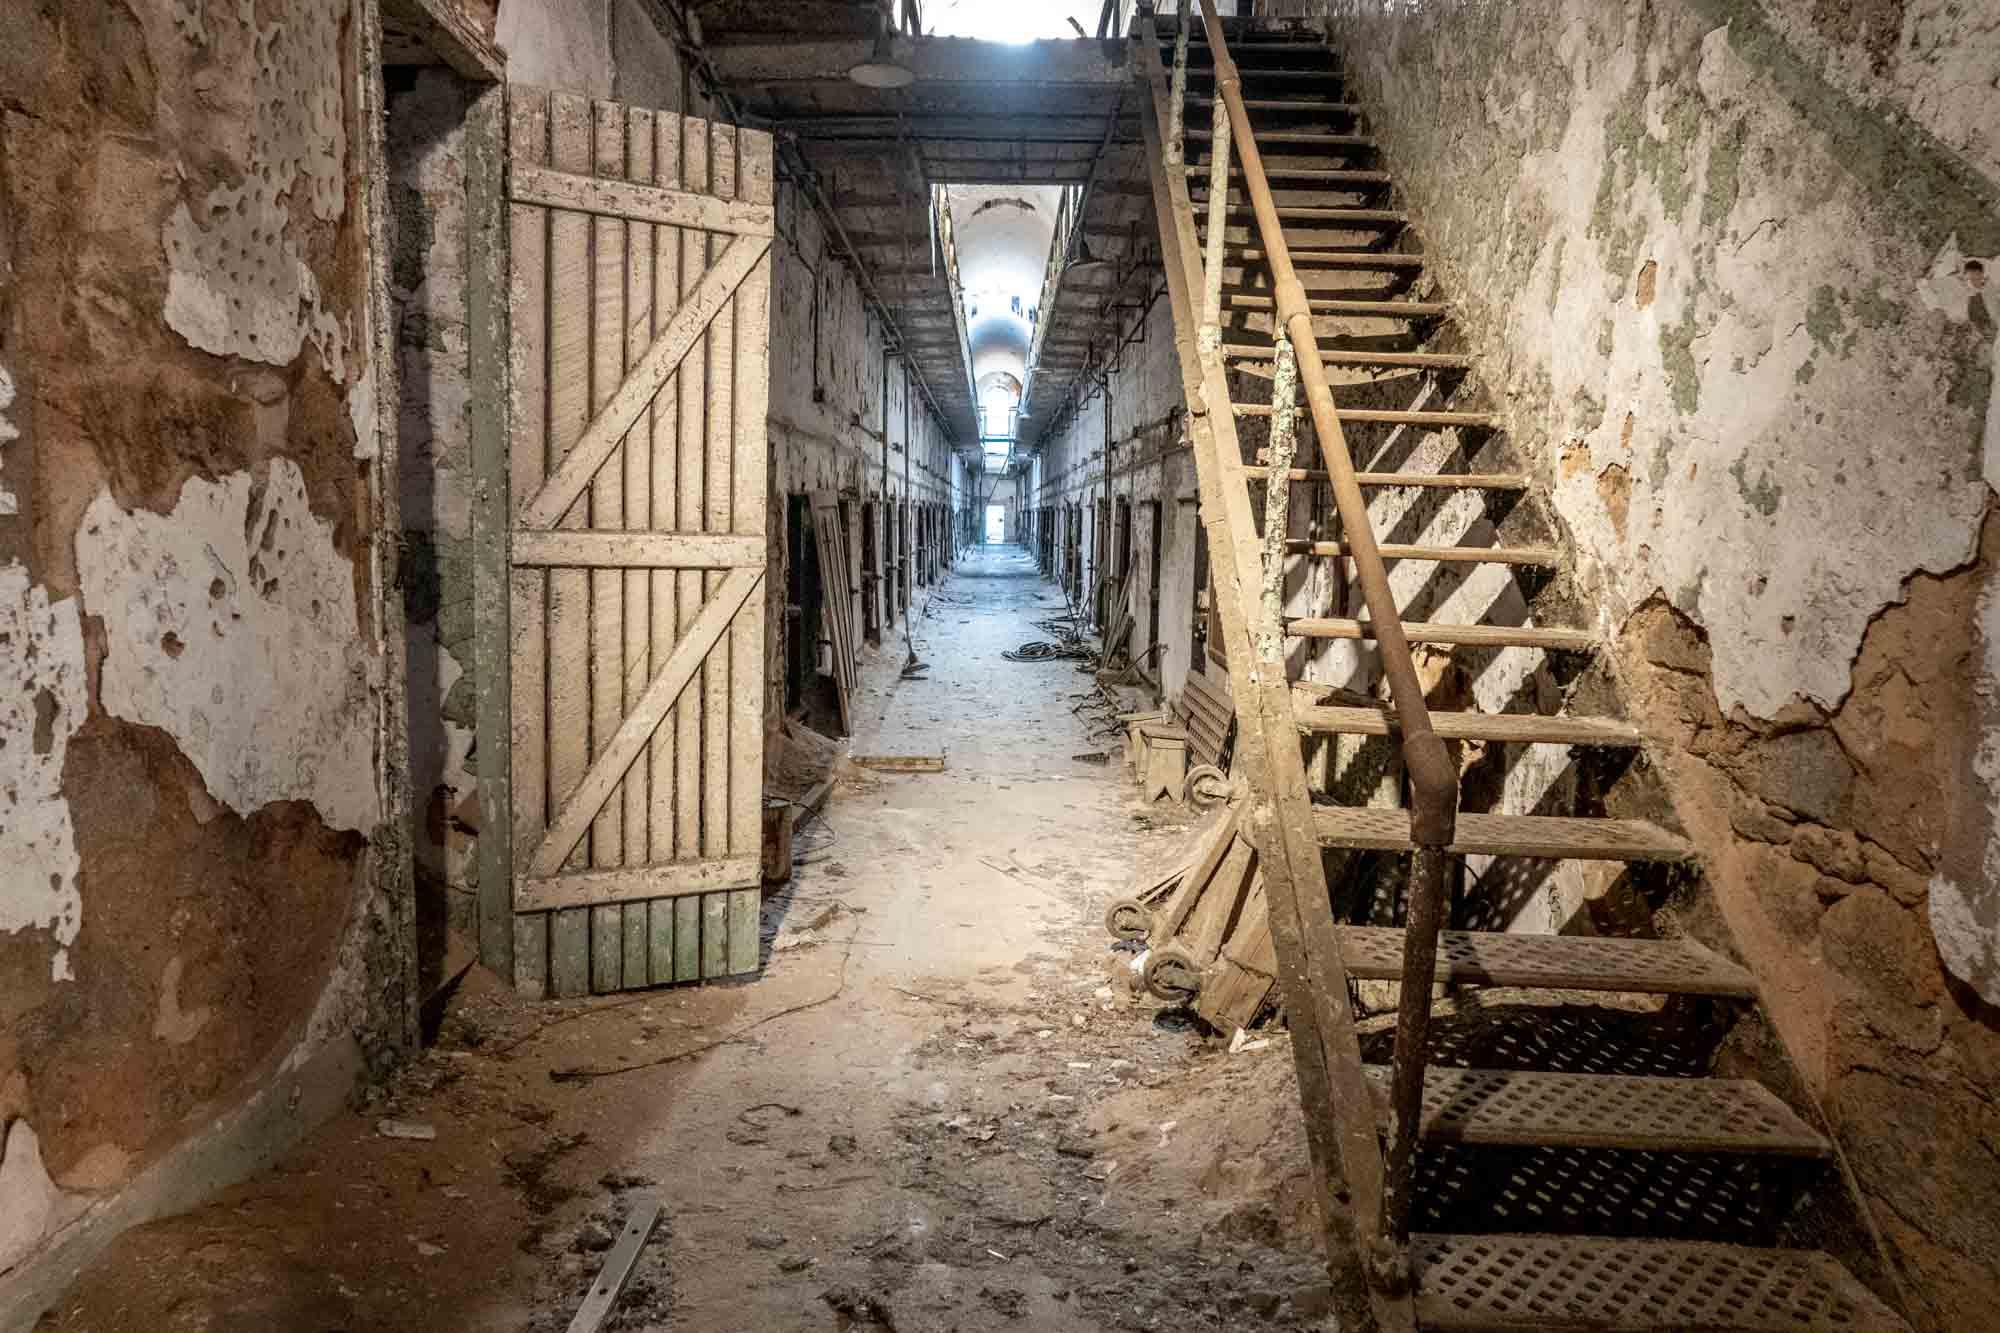 Debris in abandoned prison